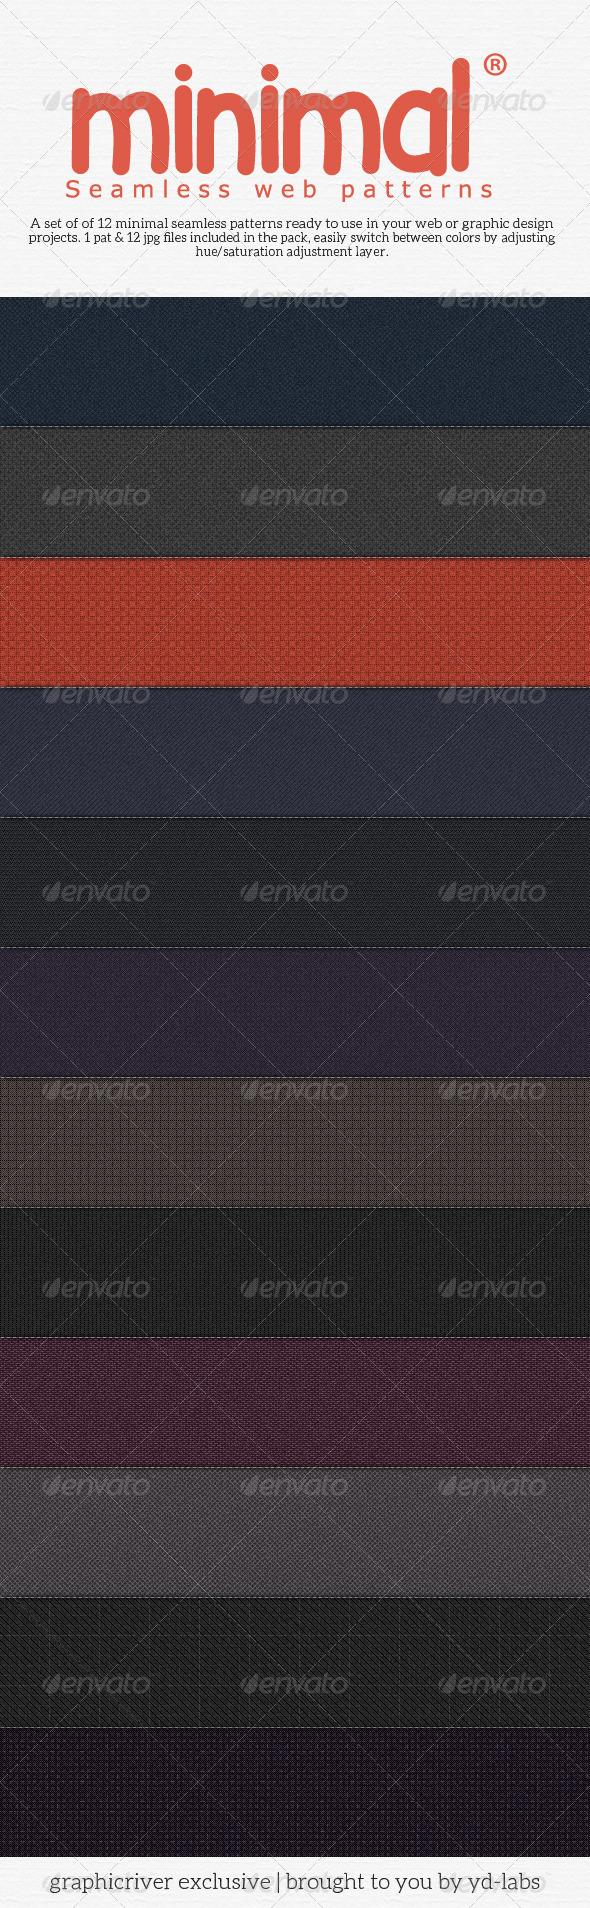 Minimal Seamless Web Patterns Pack 1 - Patterns Backgrounds